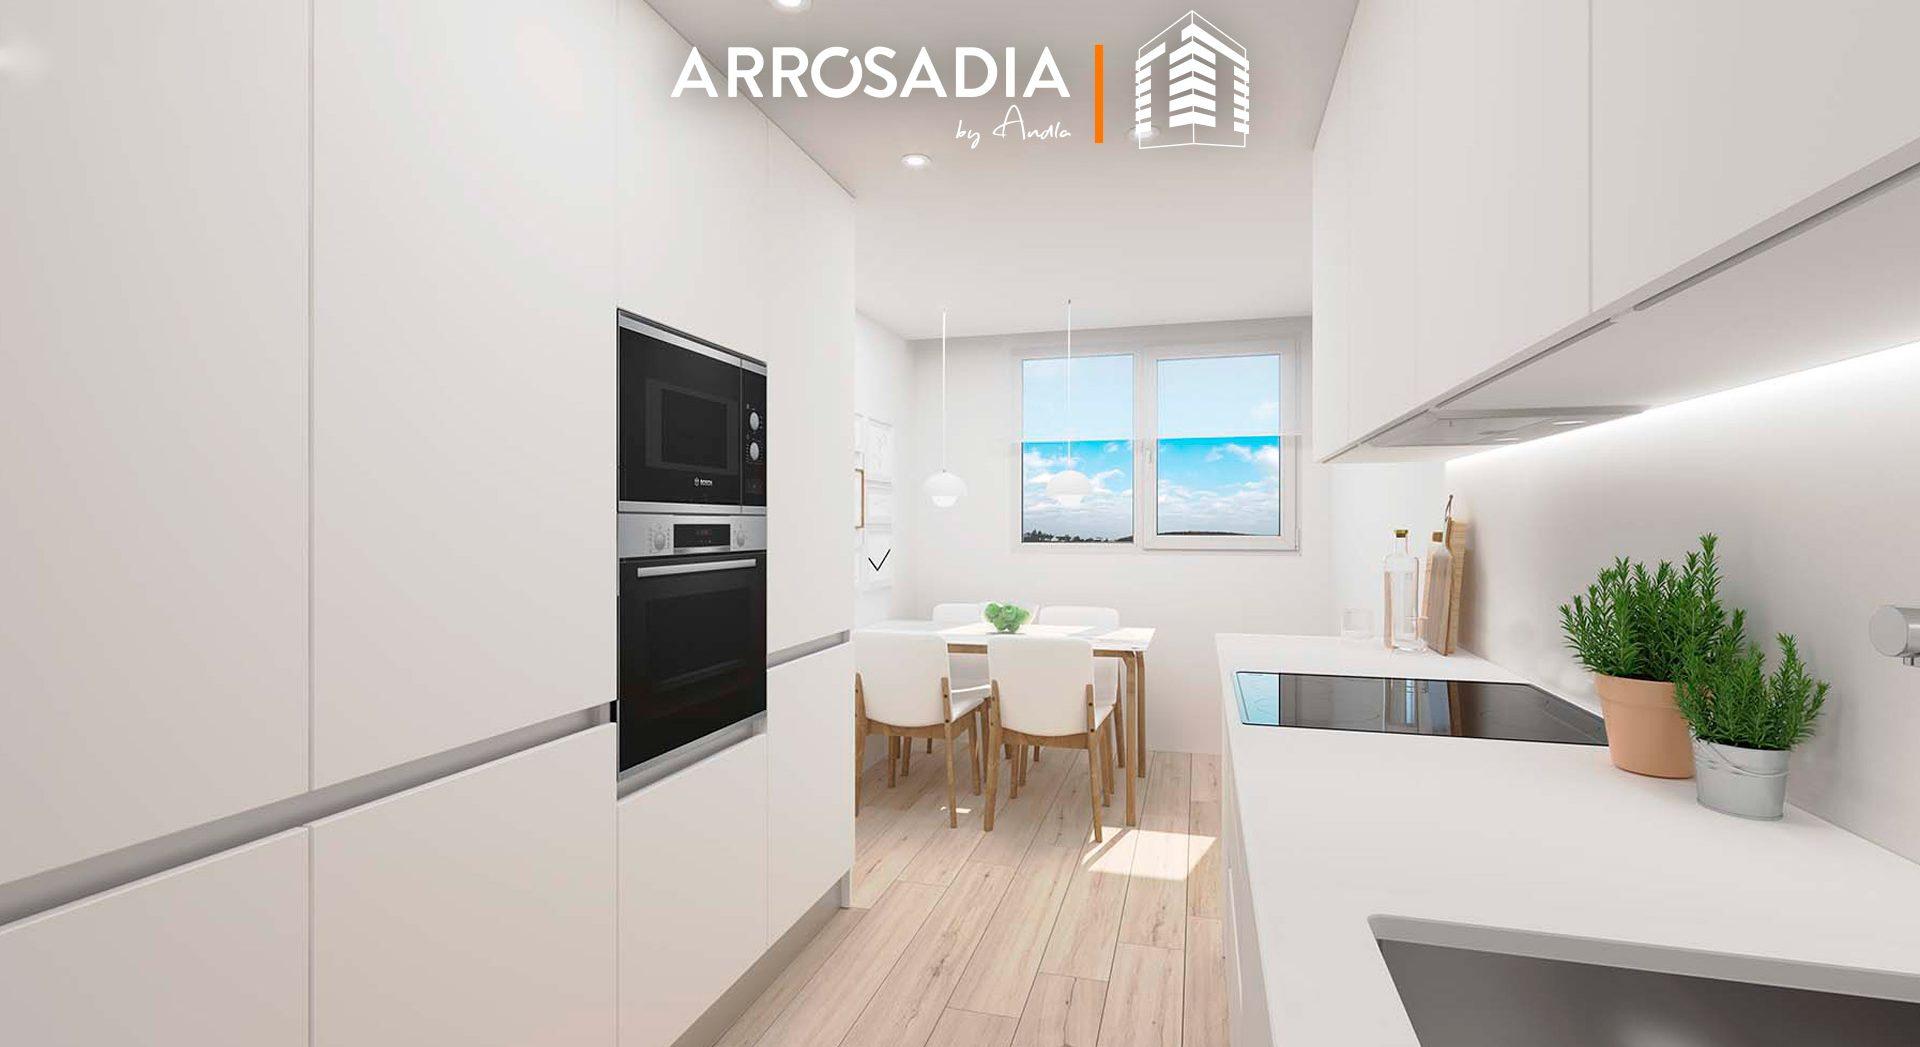 ANDIA_ARROSADIA_COCINA-slide-1920x1047